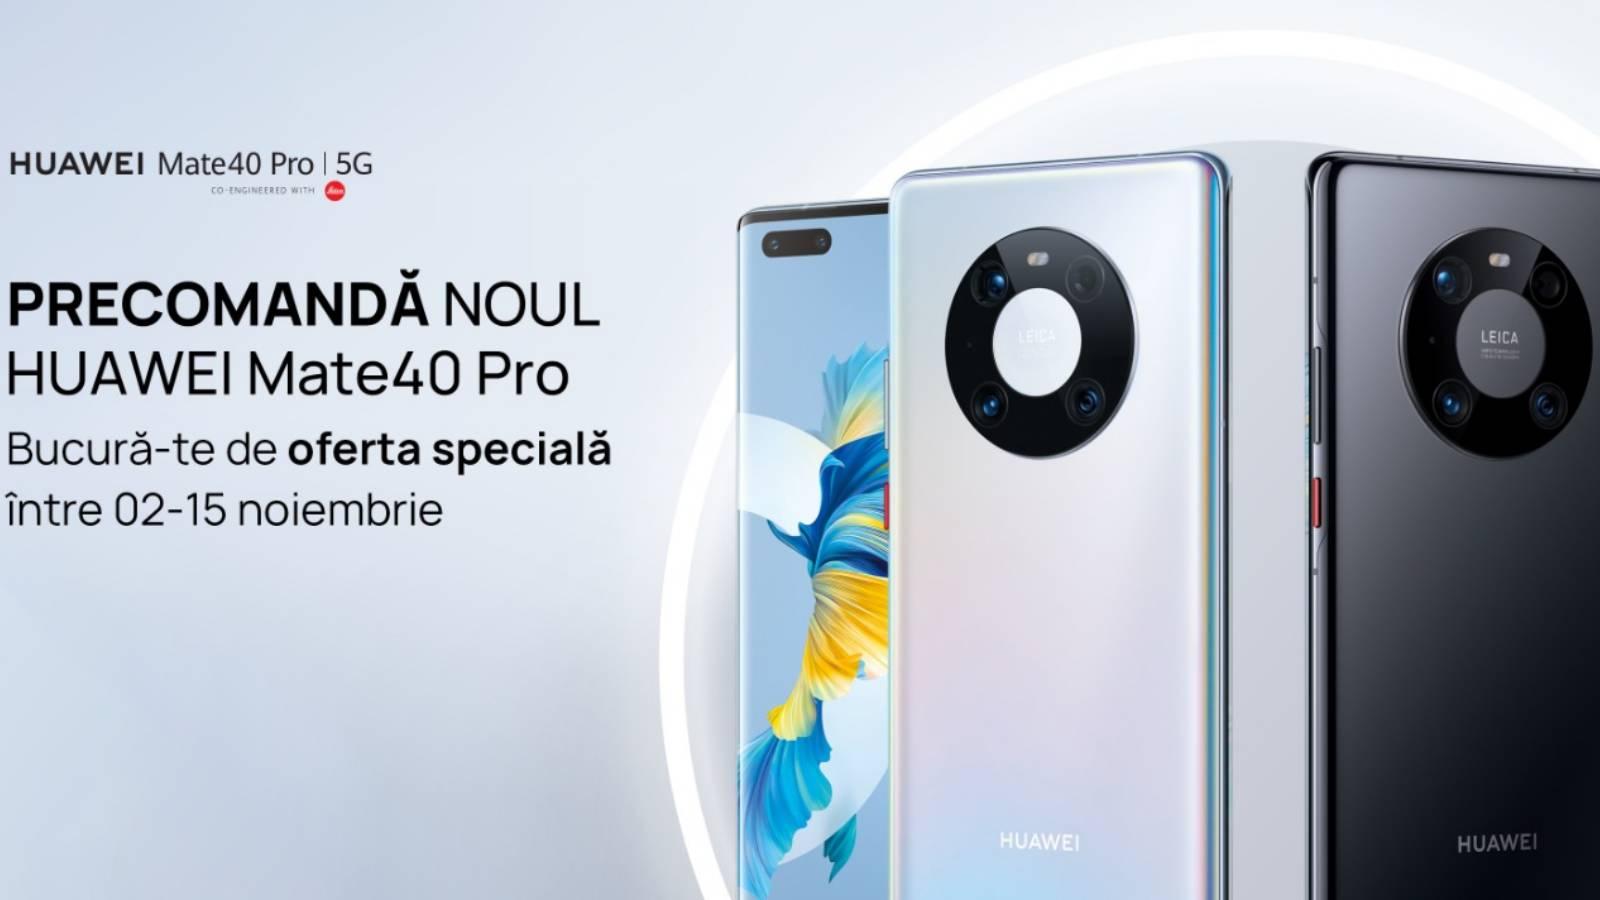 Huawei MATE 40 Pro Lansat Romania